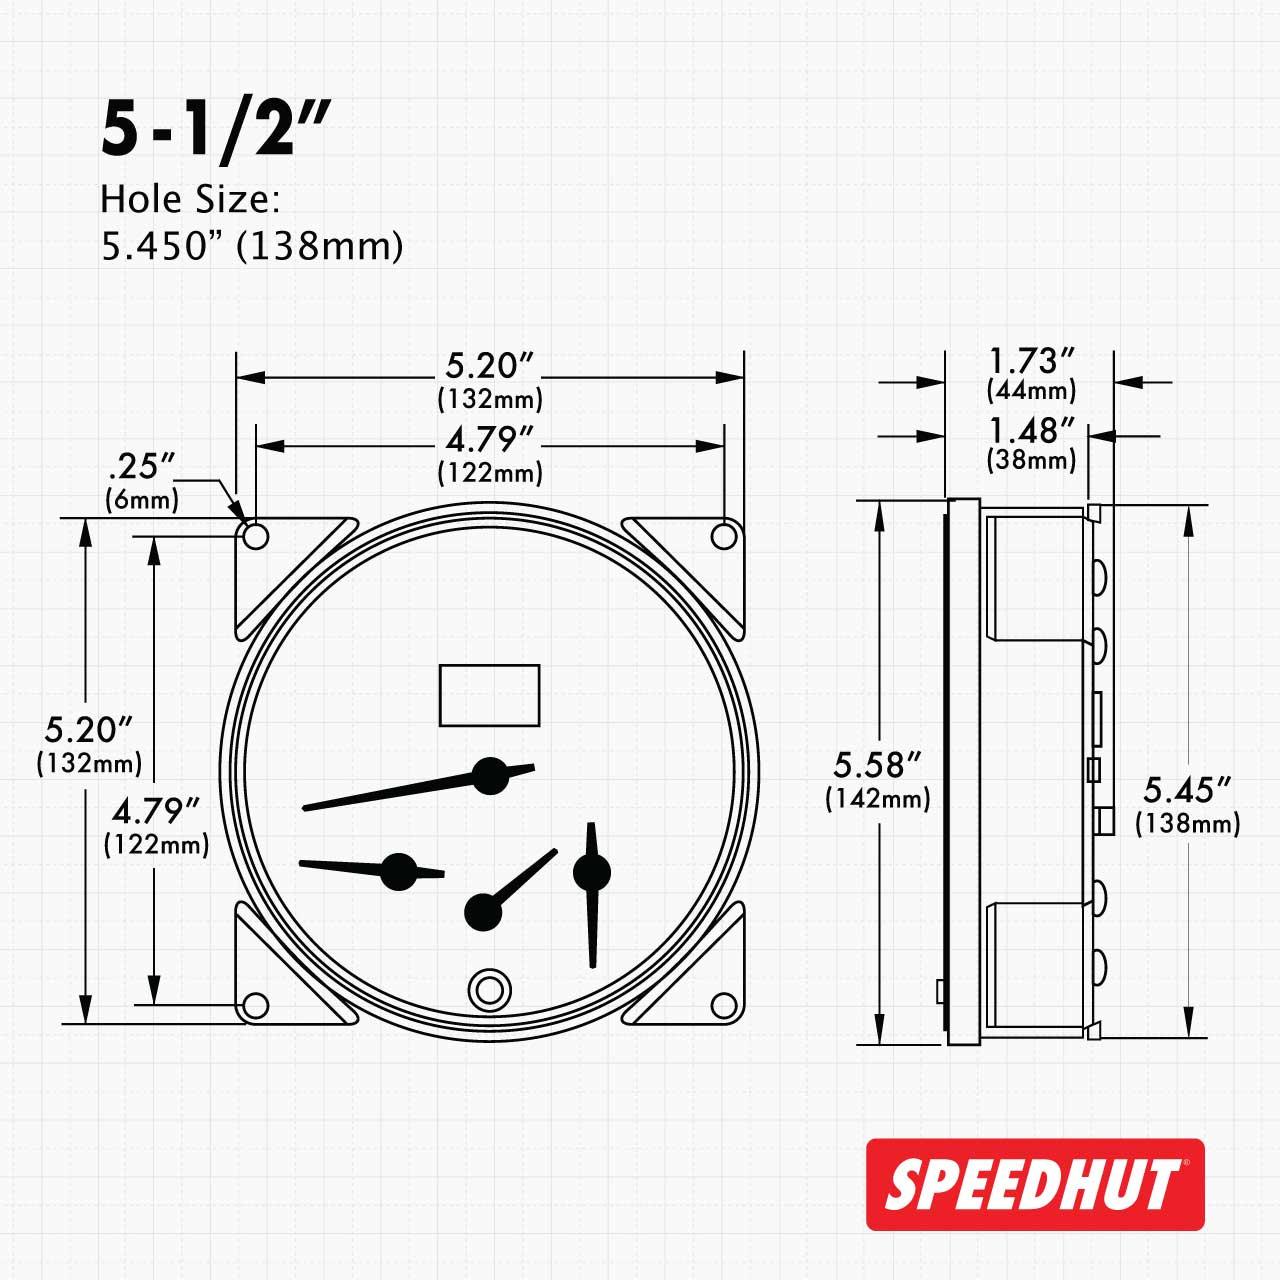 "5-1/2"" CJ Jeep GPS Speedometer Cluster 90mph/140KMH - Speedo, Fuel Level, Temp"